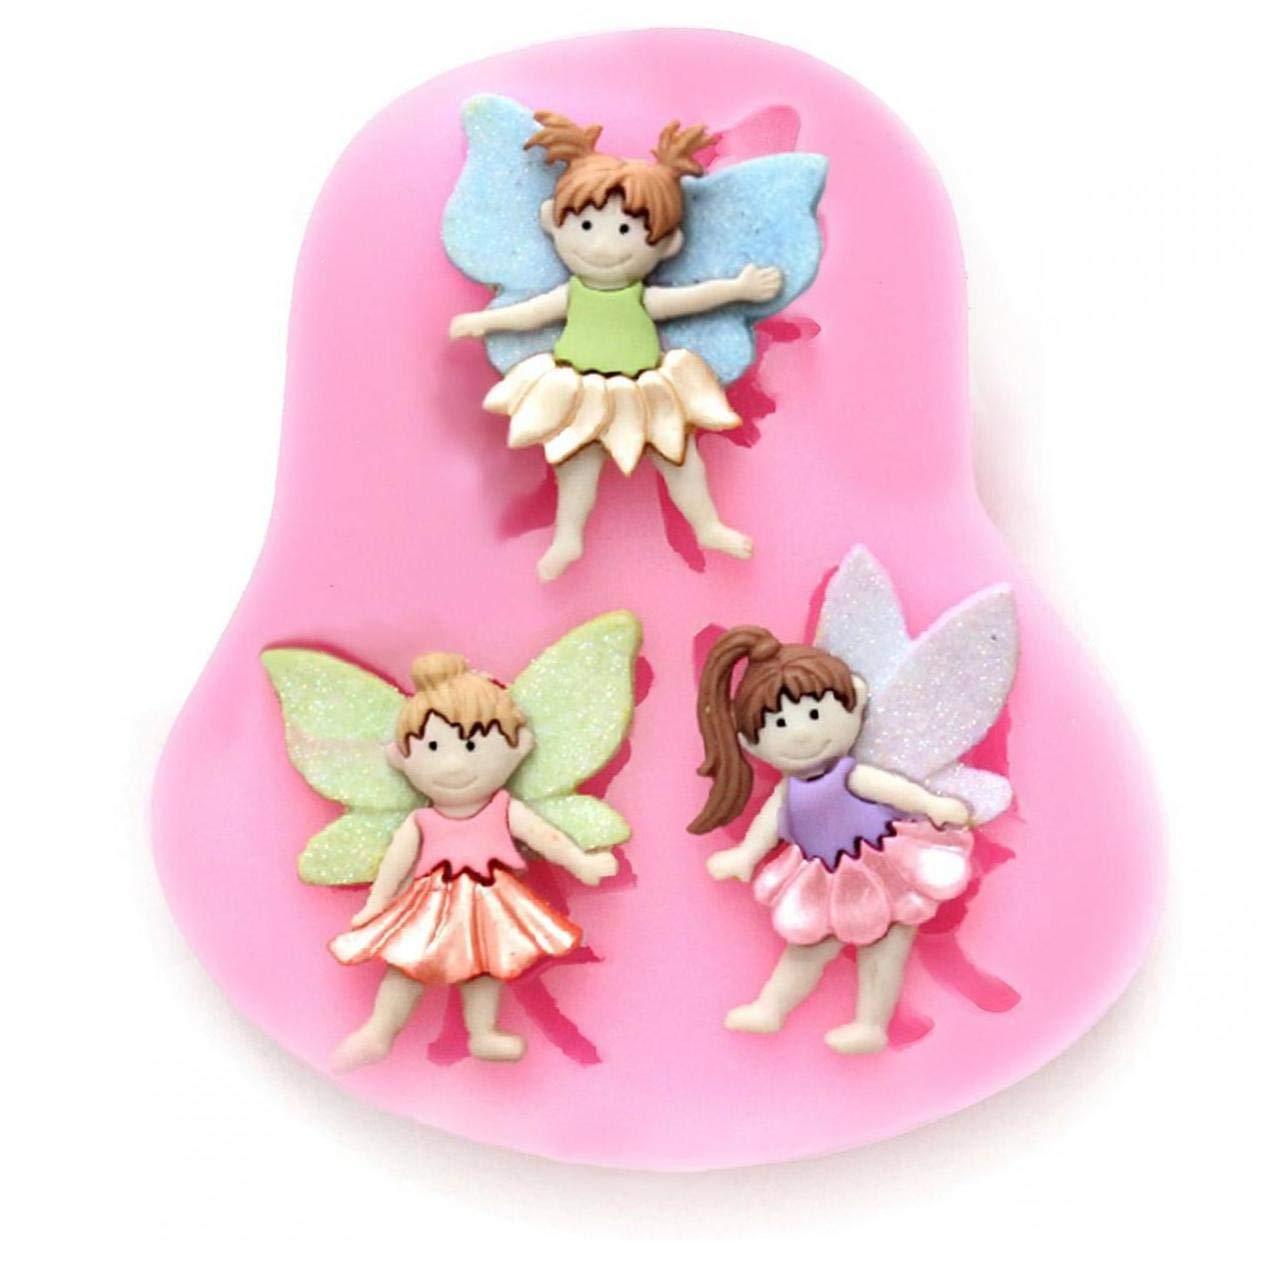 Amazon.com: Elf Fairy - Molde de silicona para fondant ...